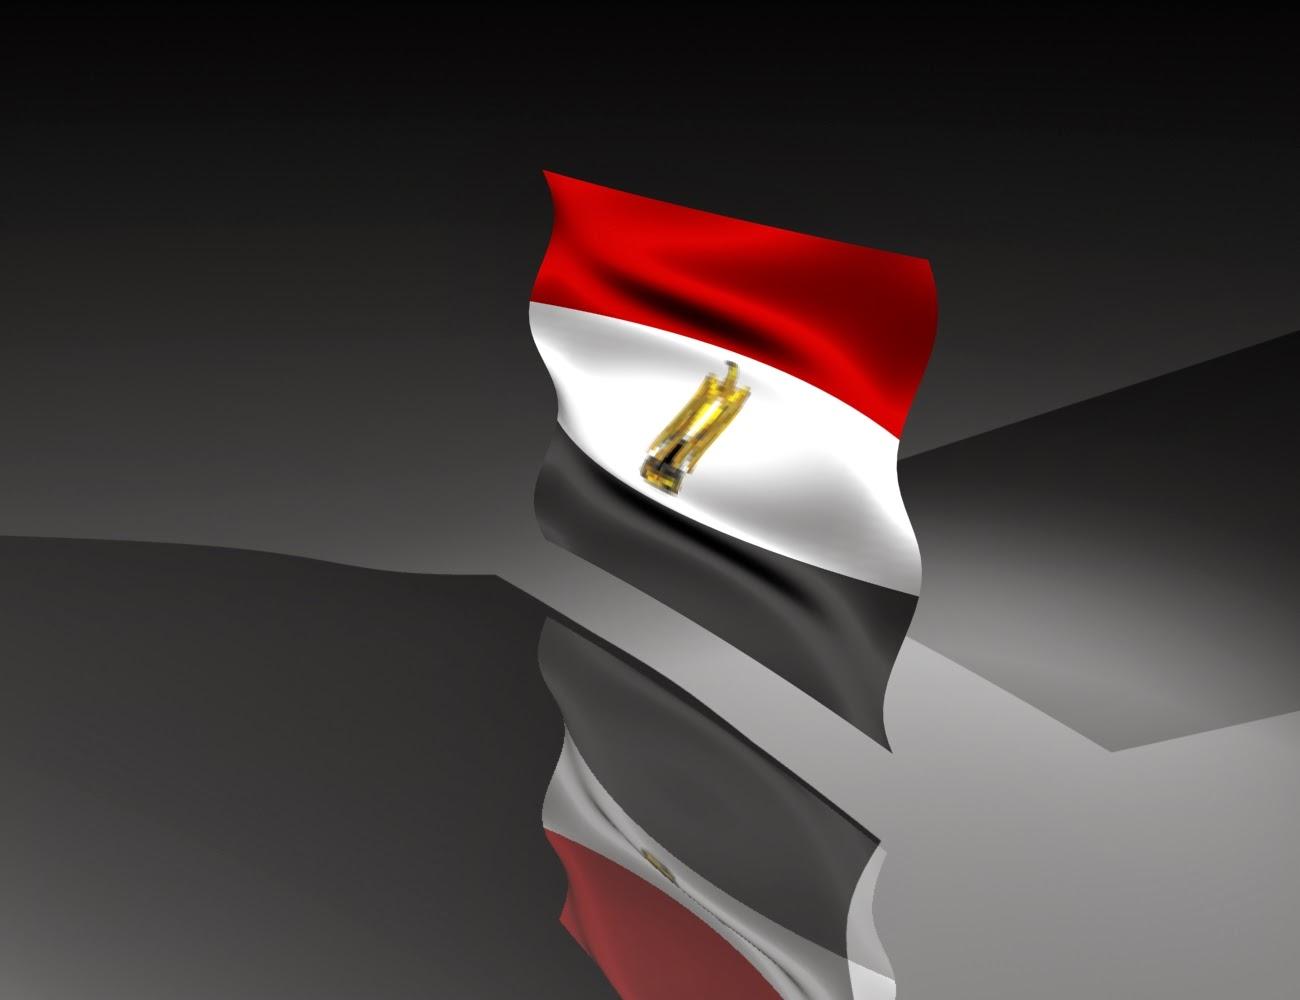 صور علم مصر Egypt (1)